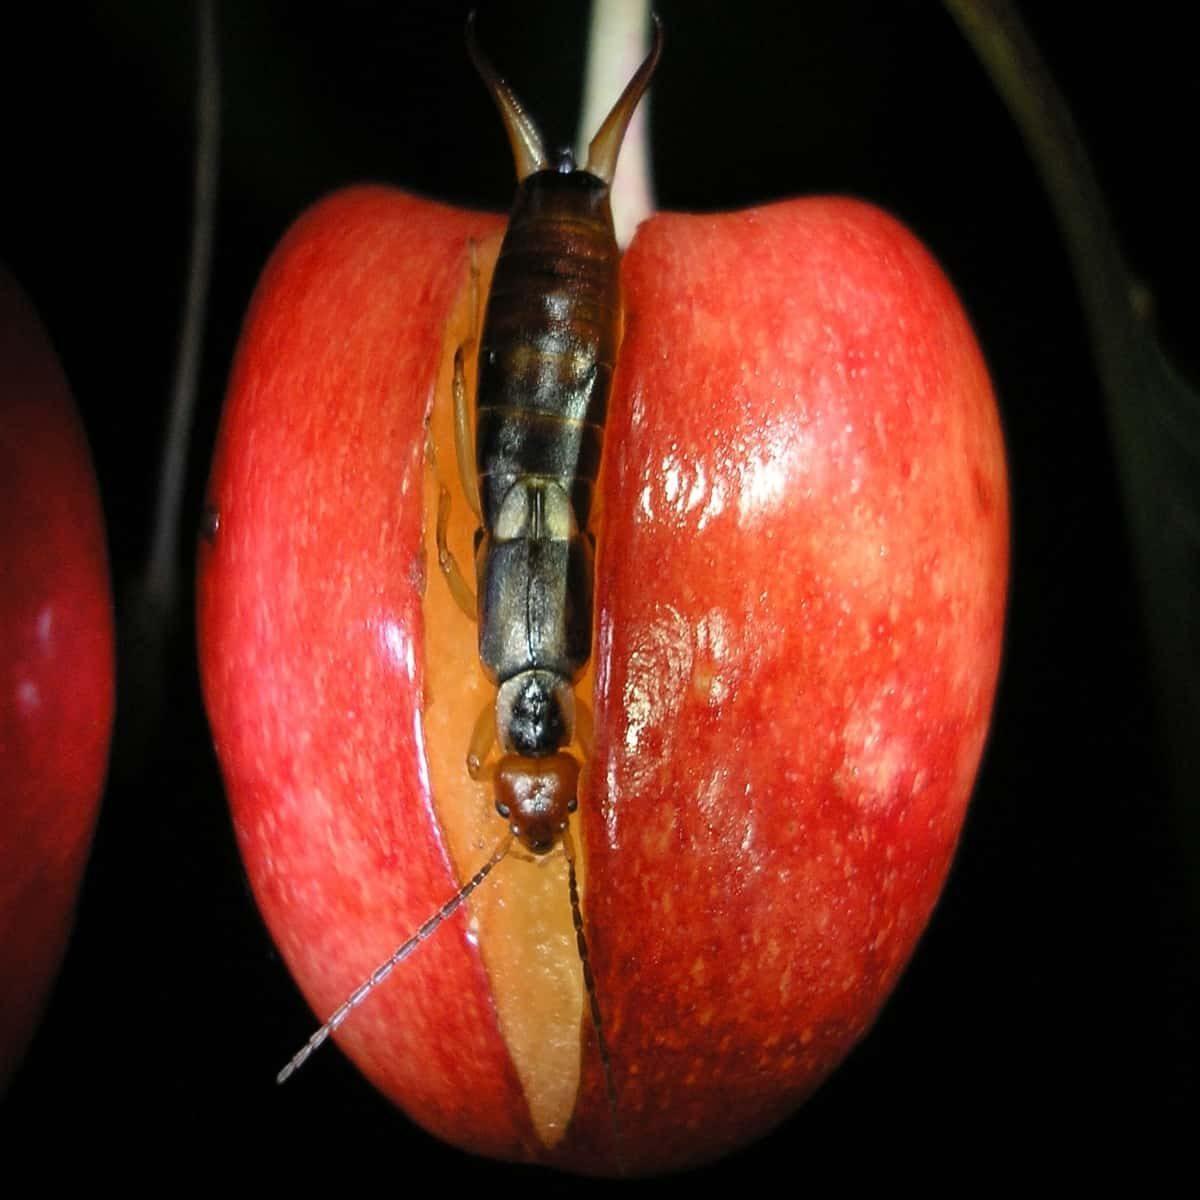 Earwig eating cherry